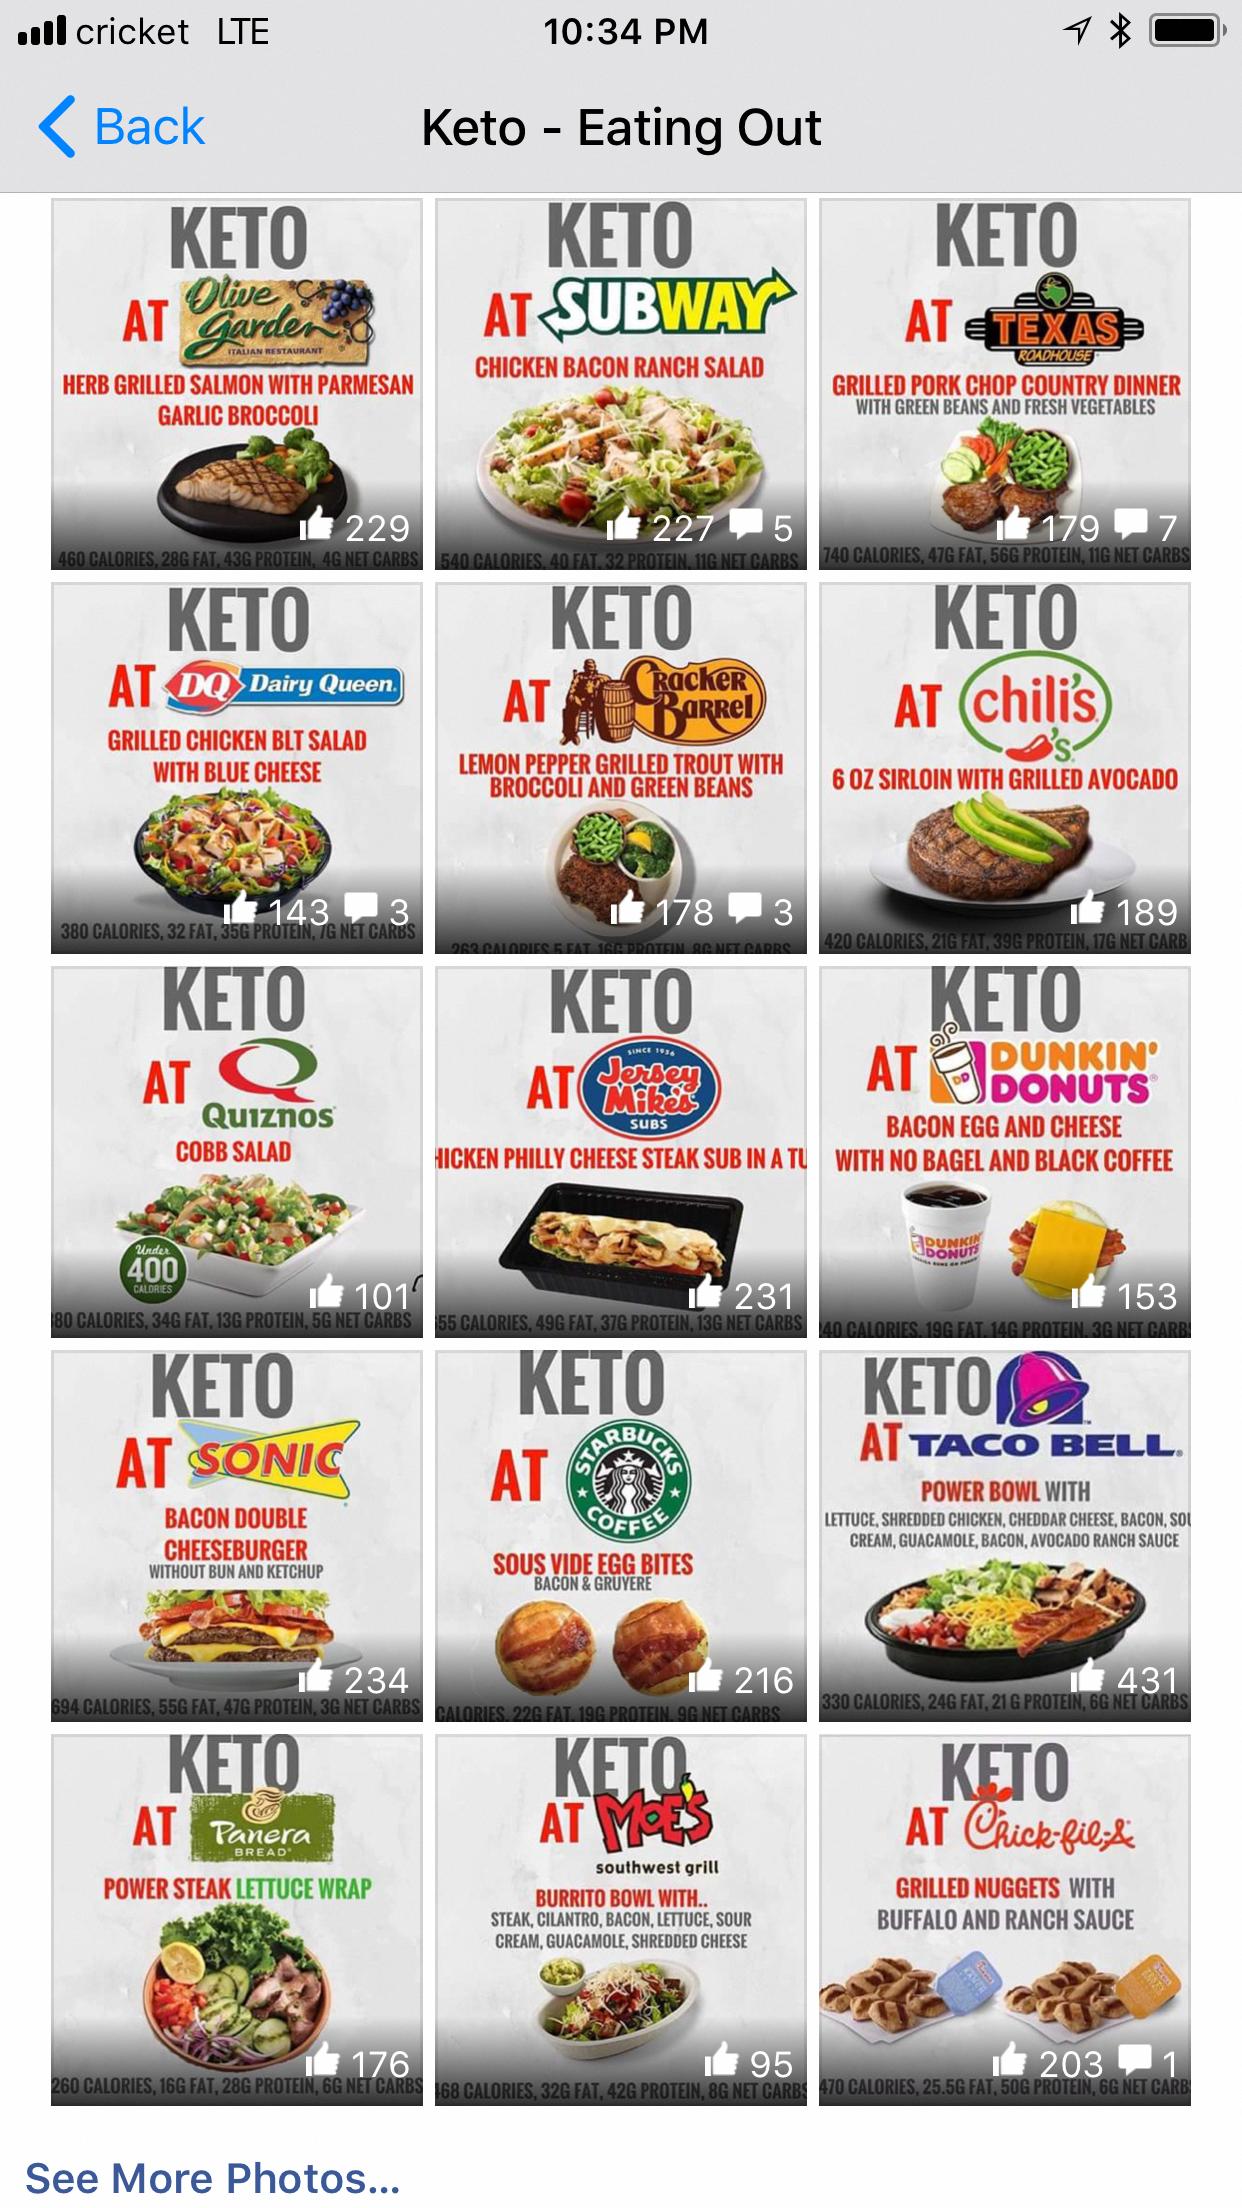 Keto Diet Meal Plan 1500 Calories Lowcarbdietfoods Keto Fast Food Keto Diet Recipes Keto Fast